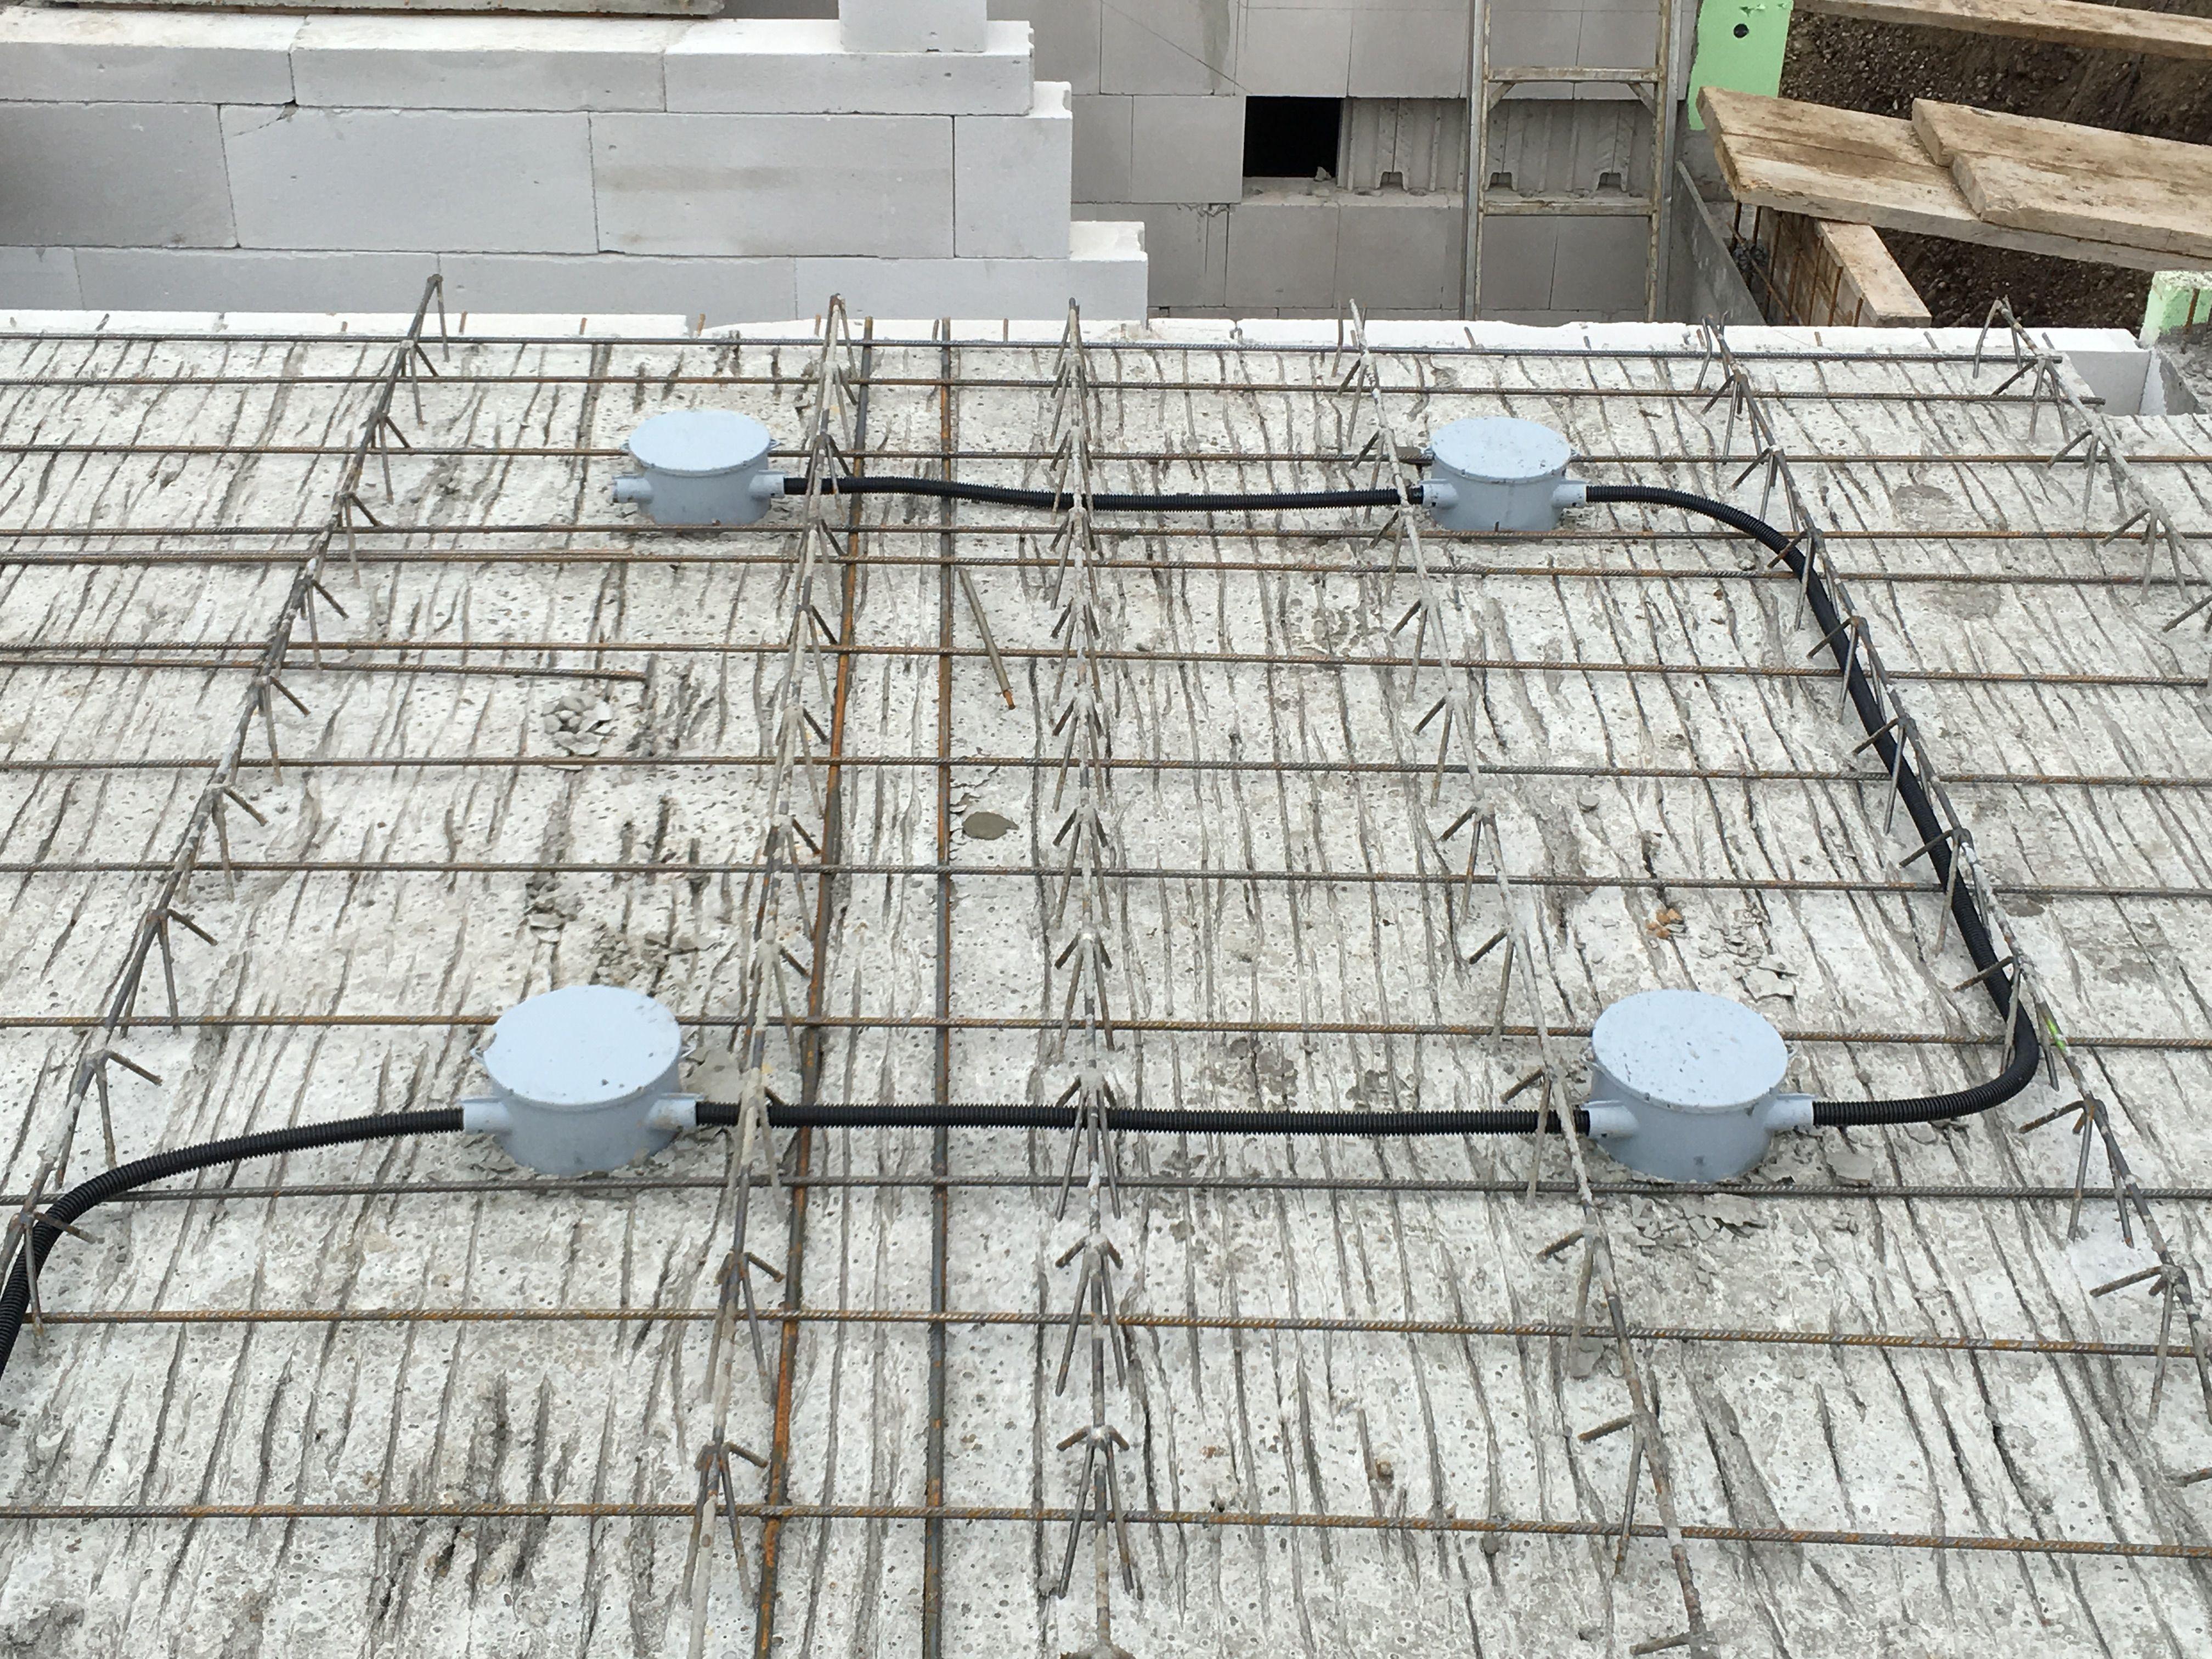 Elektroinstallation Leerrohre verbinden | Elektroinstallation ...